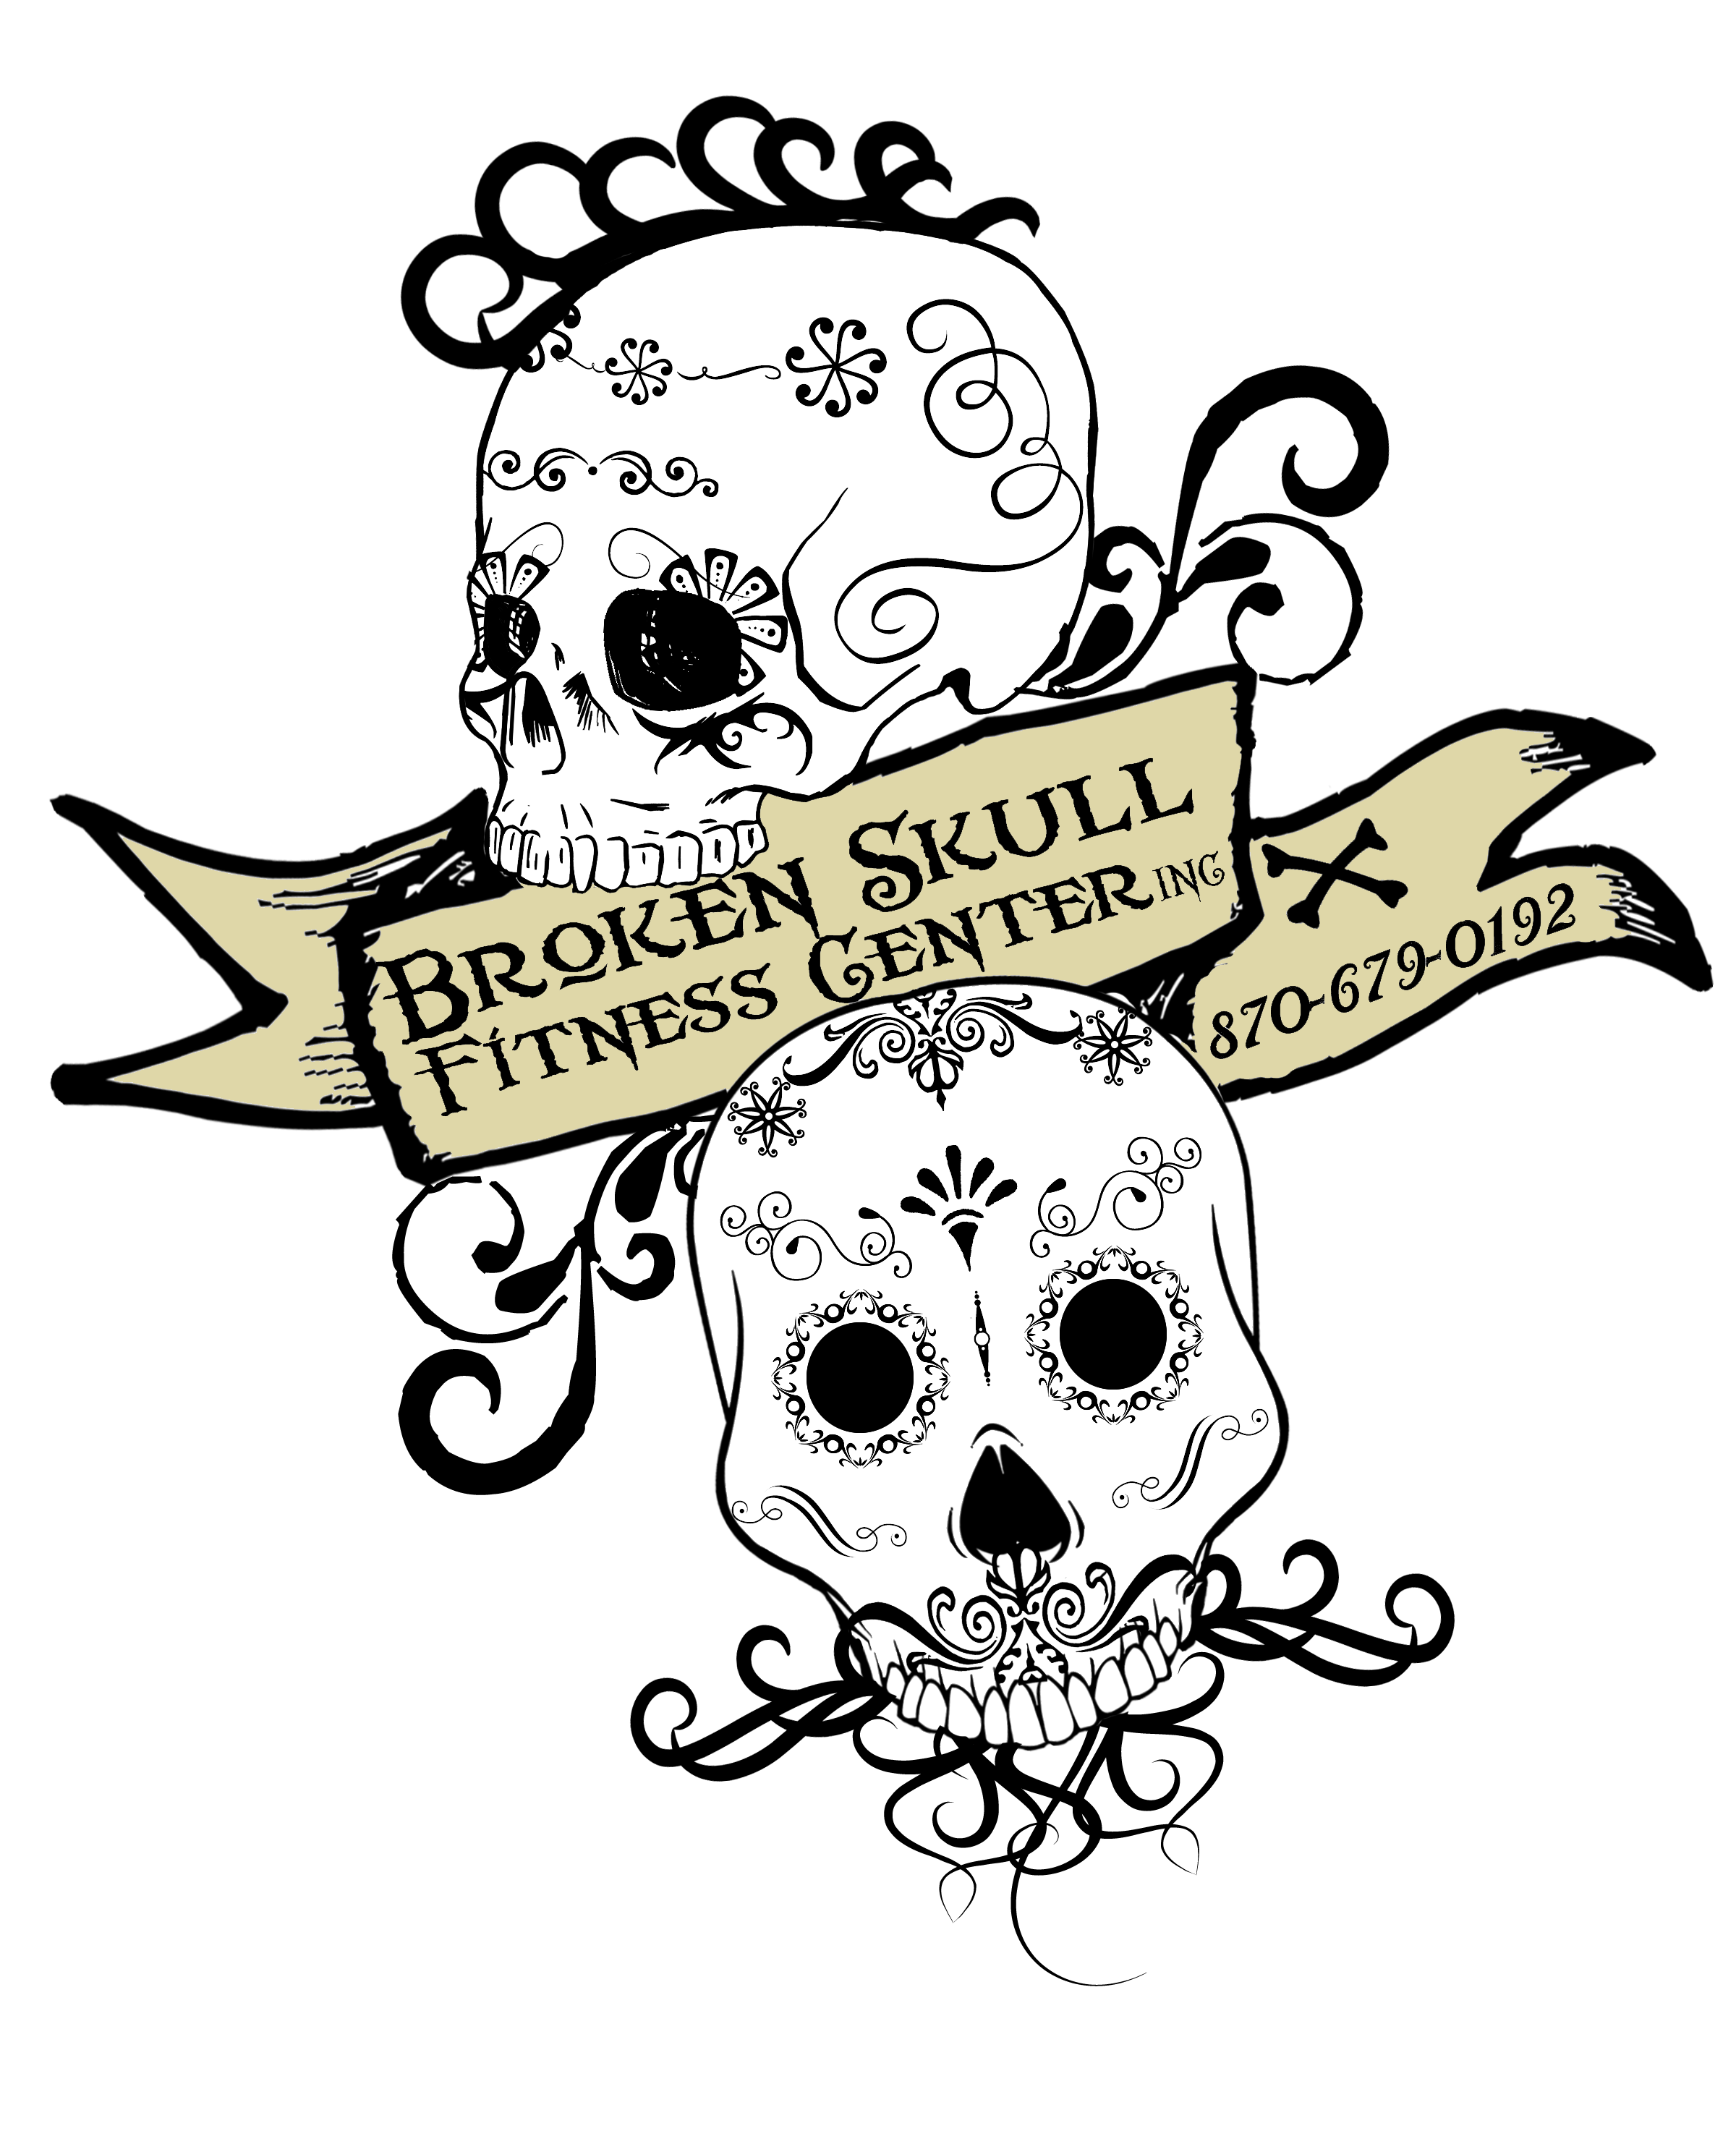 Broken Skull Fitness Center Inc filled.png